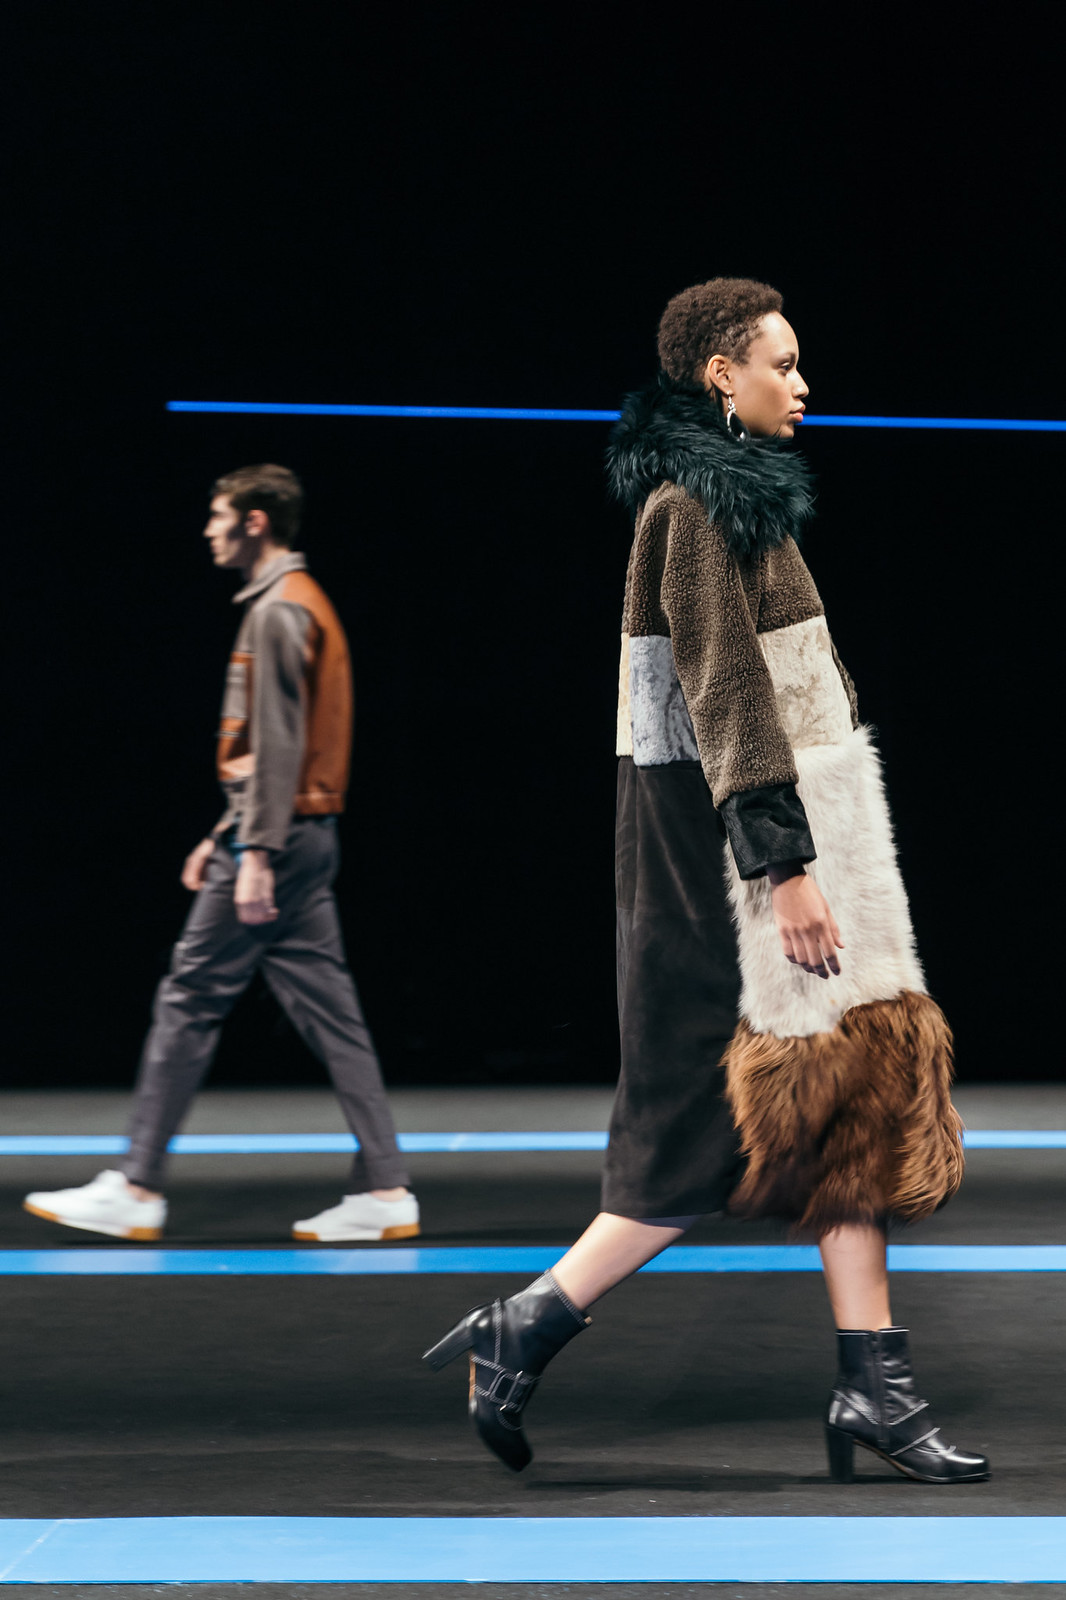 Jessie Chanes - Seams for a desire - 080 Bacelona Fashion #080bcnfasion -47